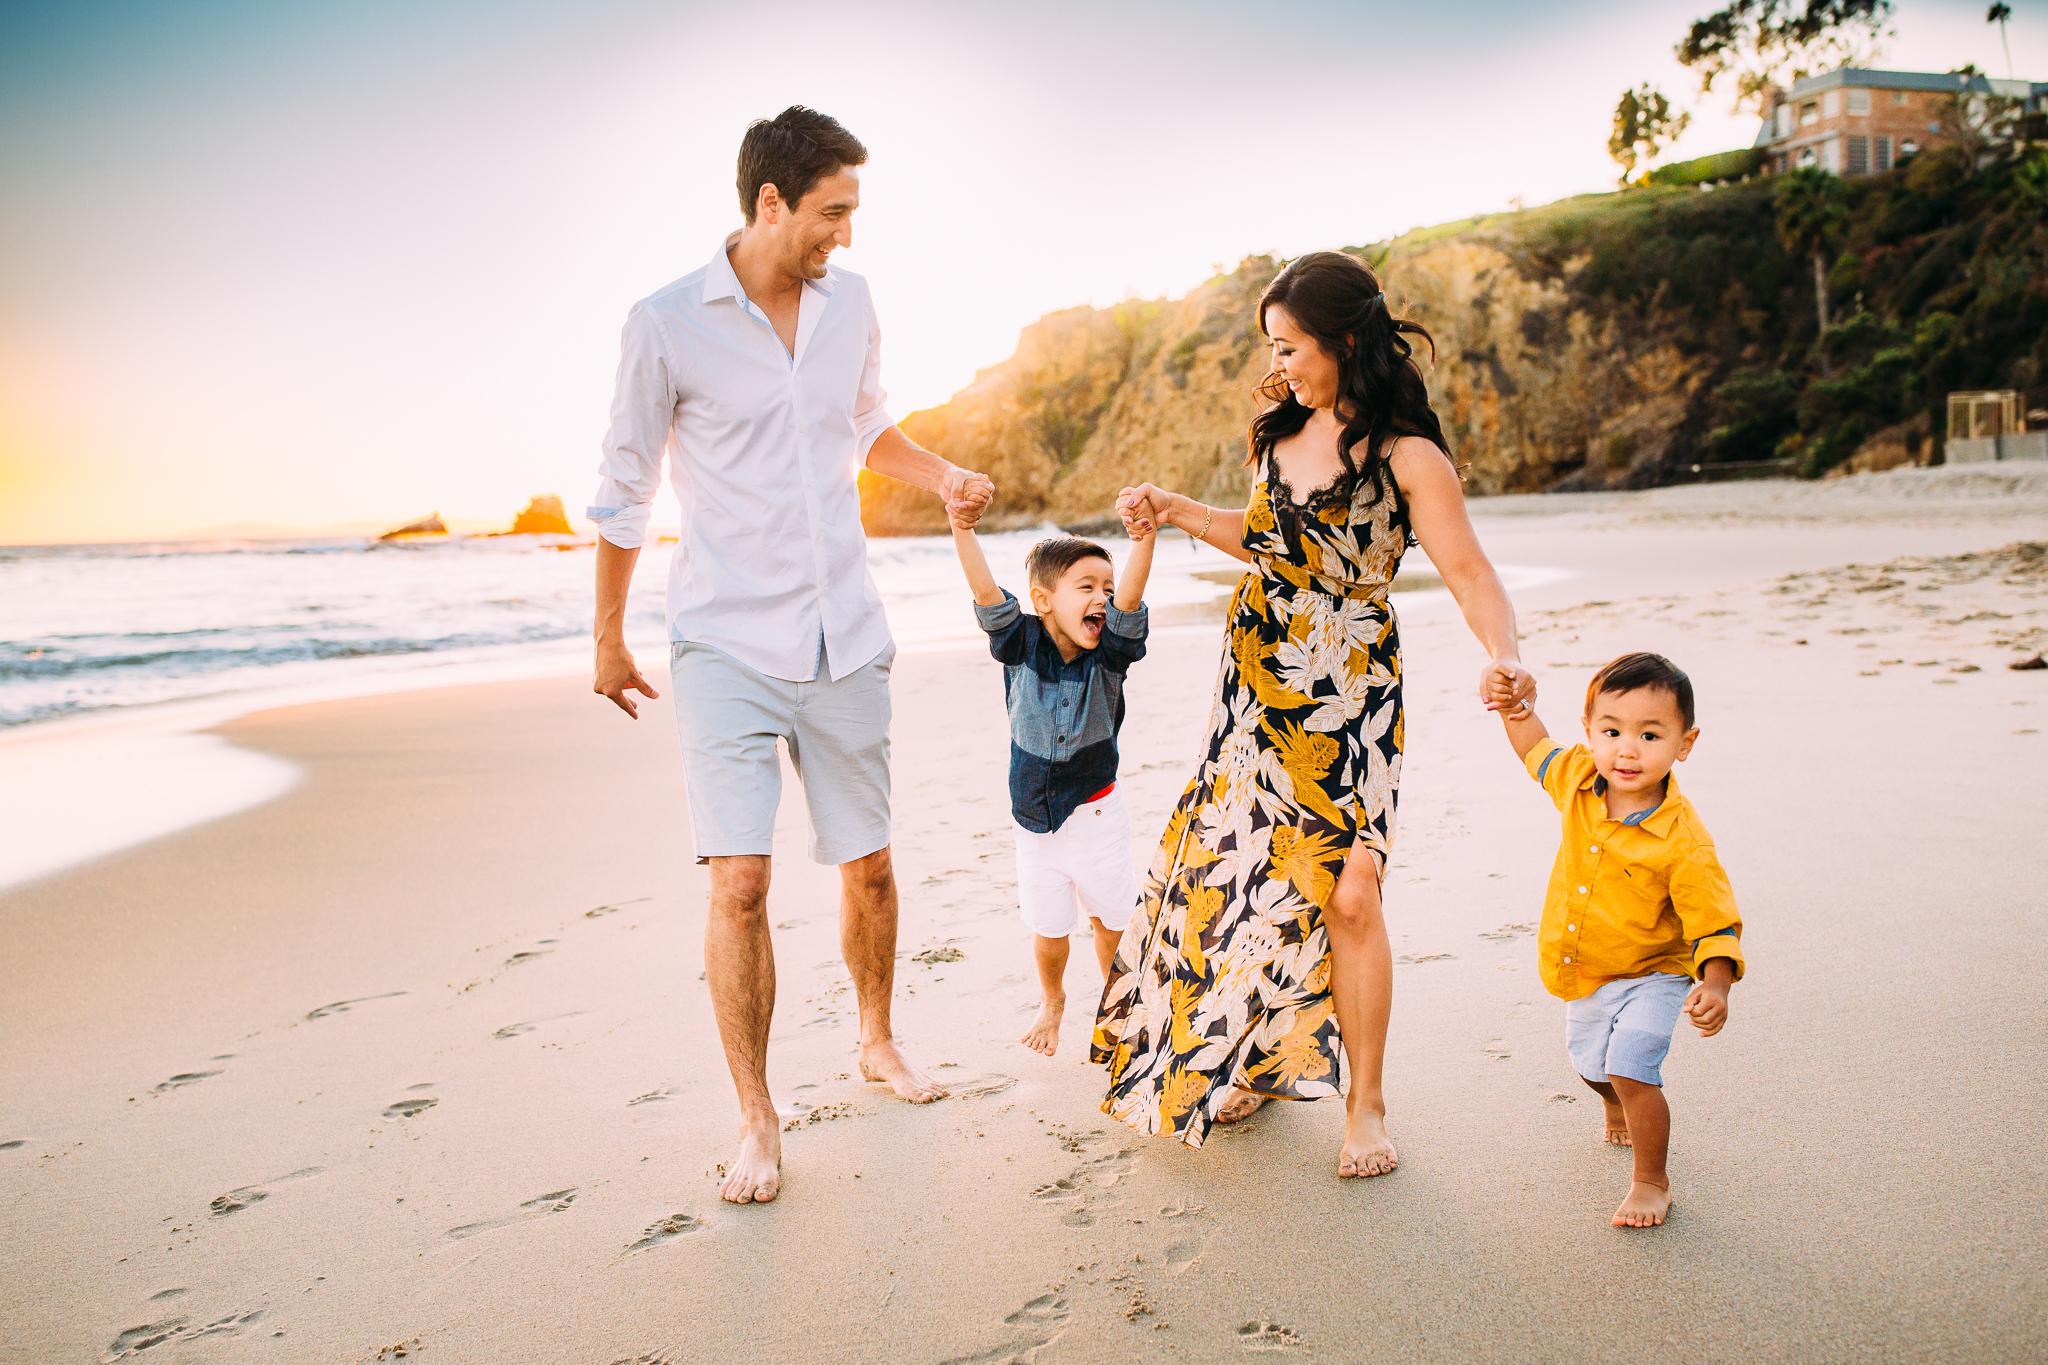 lagunabeachfamilyphotographer-14.jpg